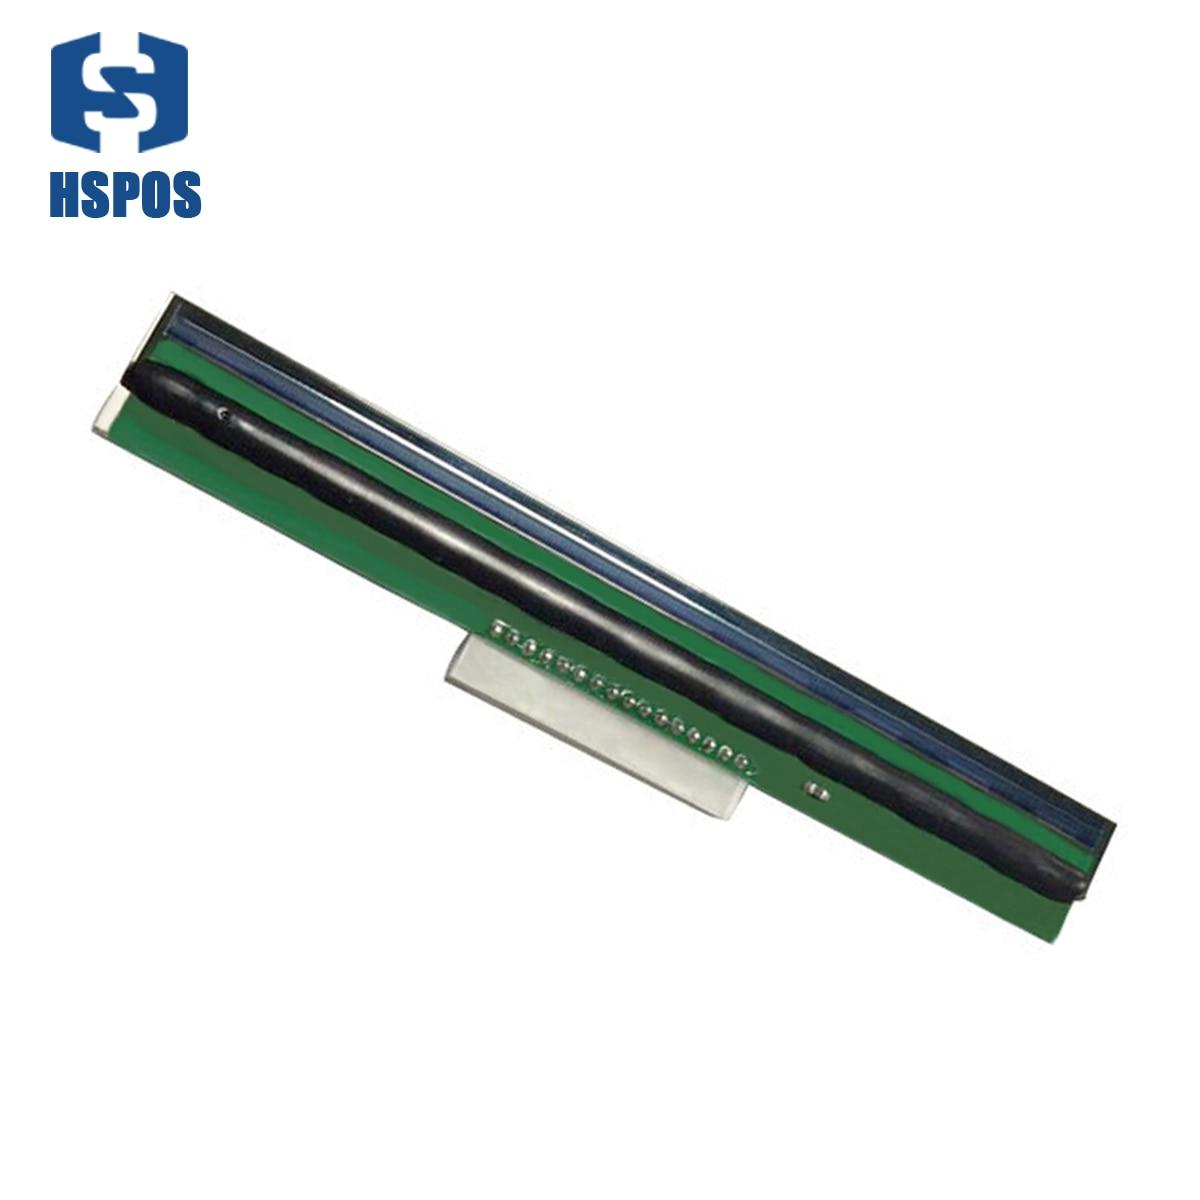 HSPOS شحن مجاني الأصلي الطباعة الحرارية رأس الطباعة الملحقات GODEX G500U EZ-1100/1105/ZA-124-U